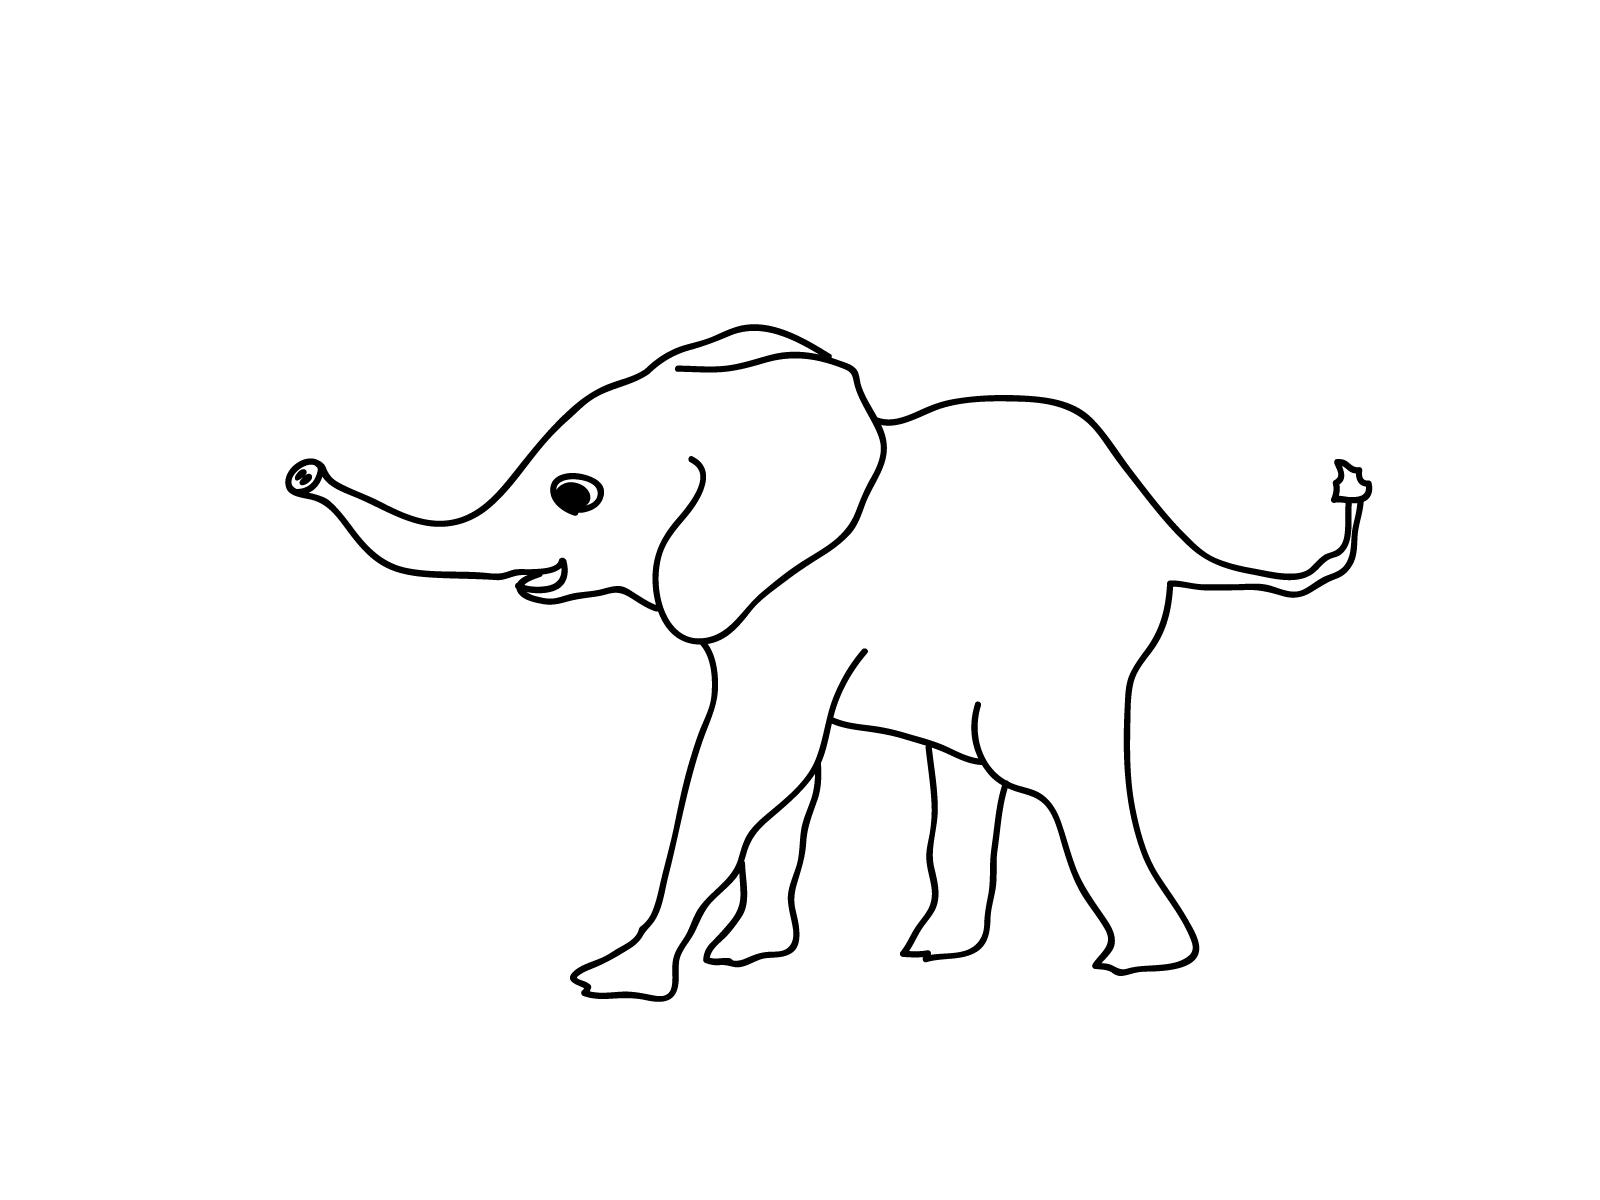 Planse Desene Colorat Elefant 10 Halloween